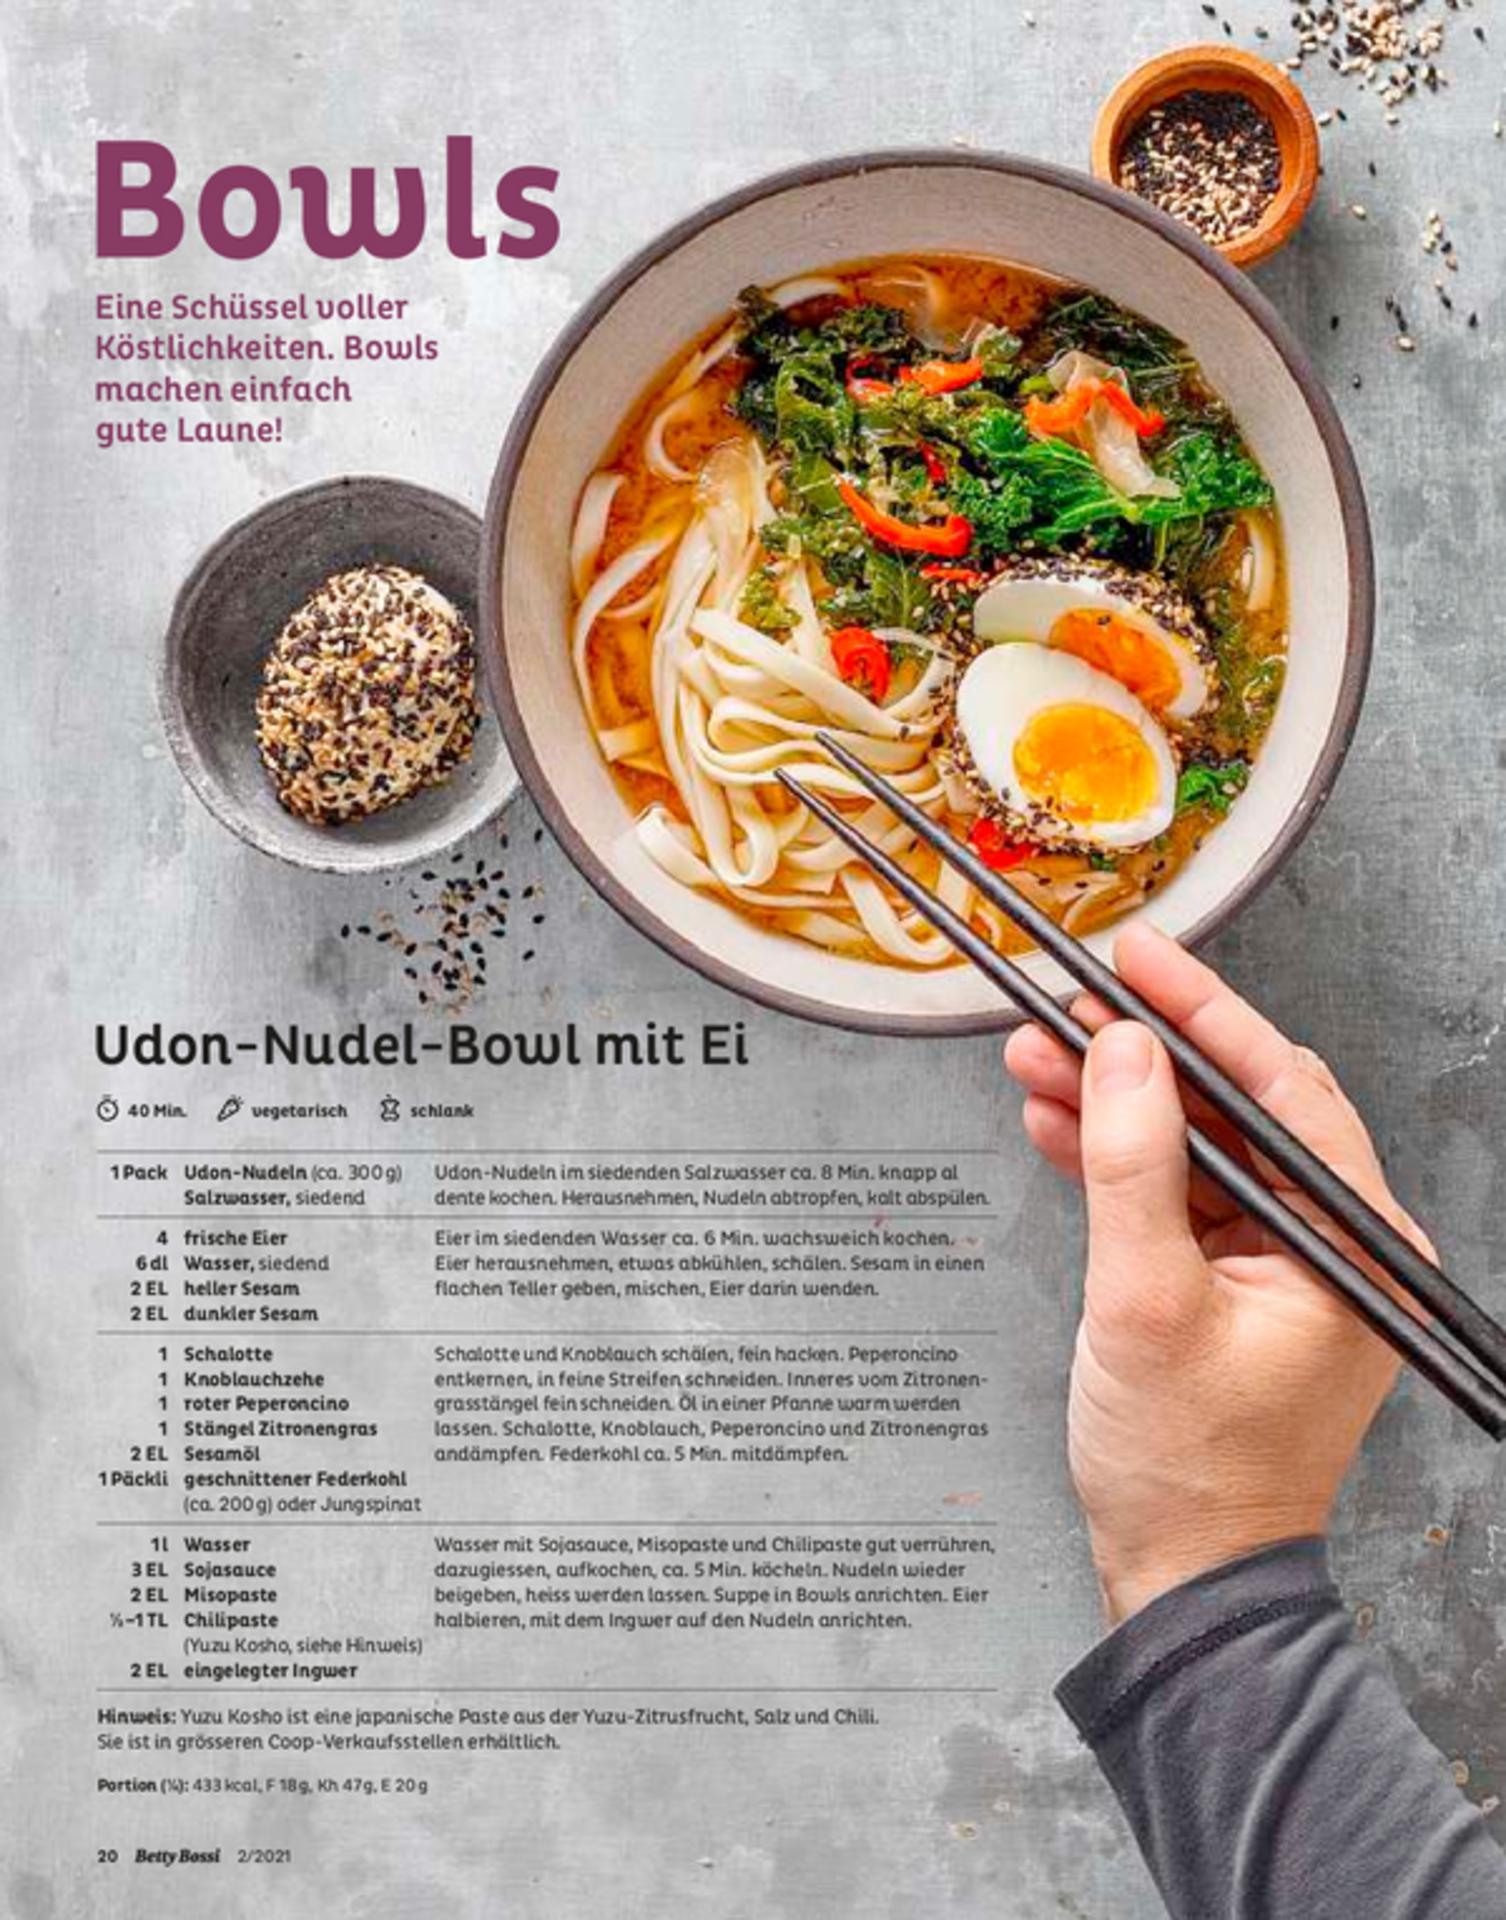 Udon-Nudel-Bowl mit Ei